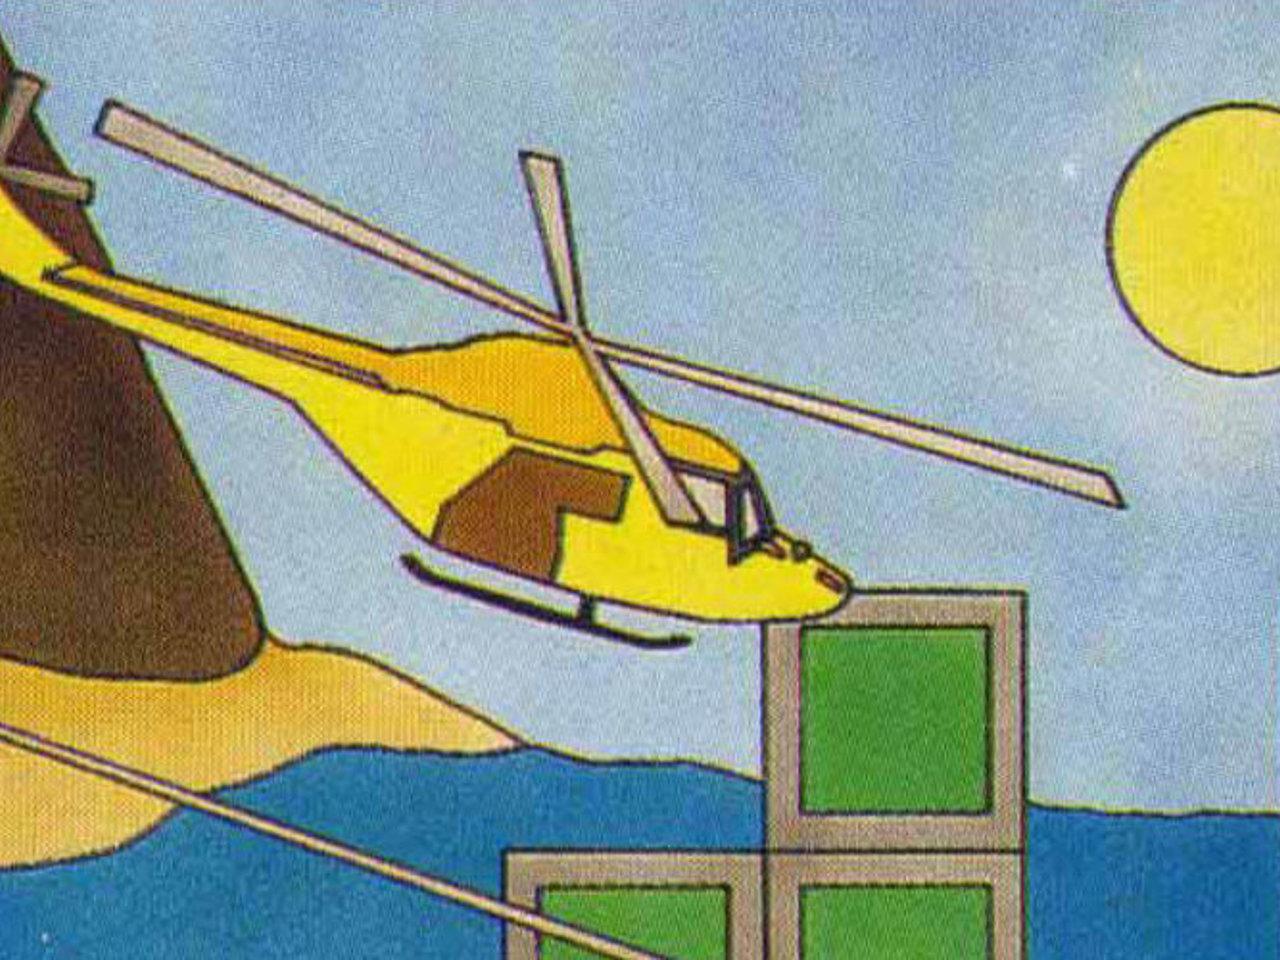 Catastrophes verlegt das Tetris-Prinzip auf dem Meer. (Bild: André Eymann)